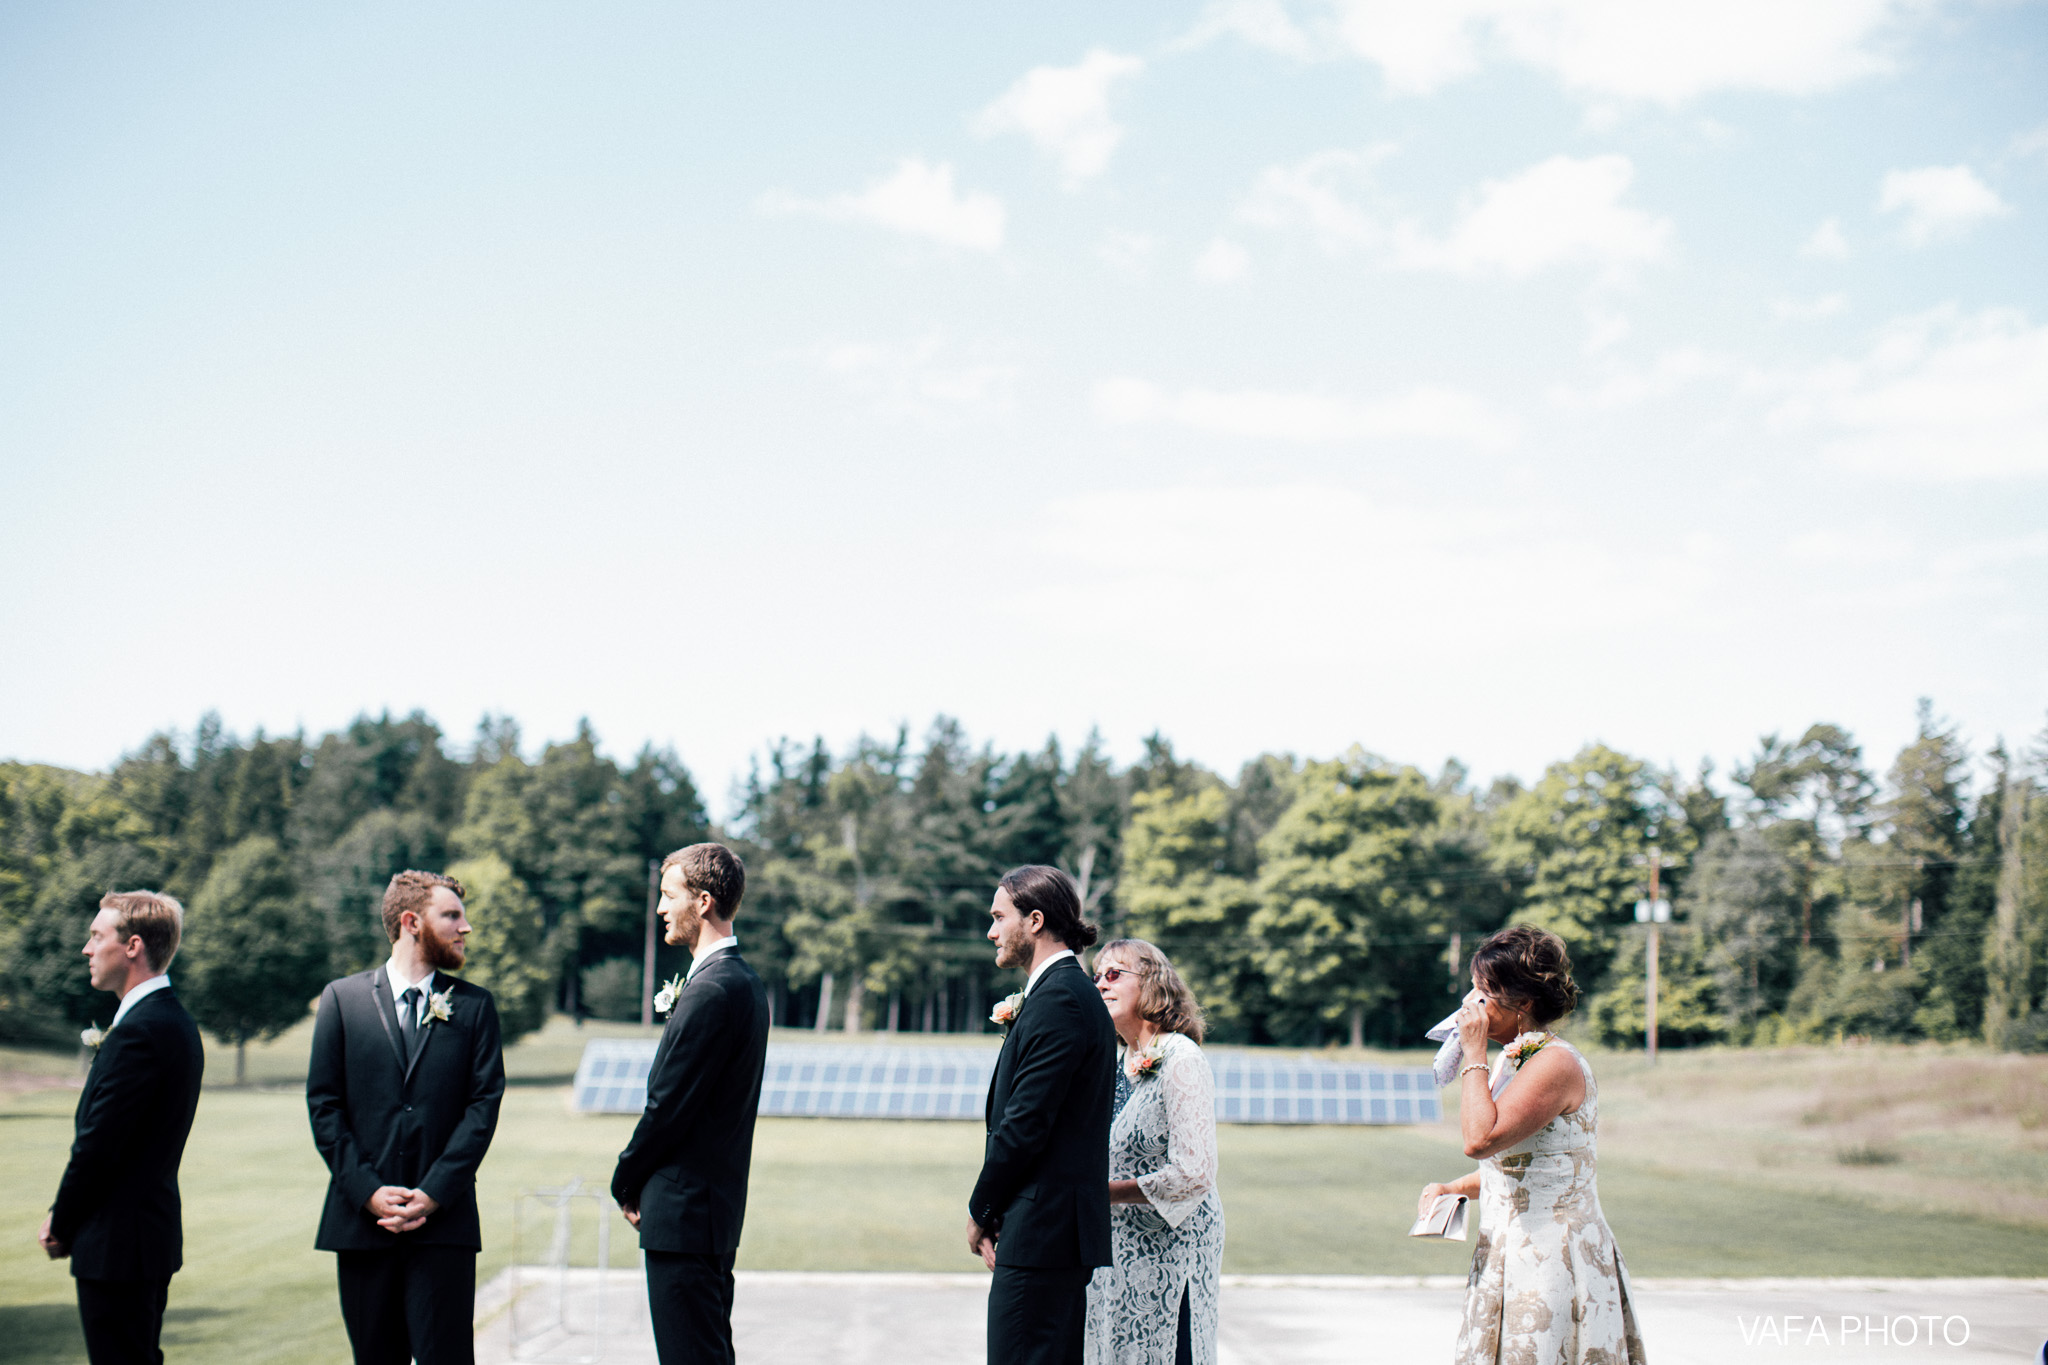 The-Felt-Estate-Wedding-Kailie-David-Vafa-Photo-213.jpg